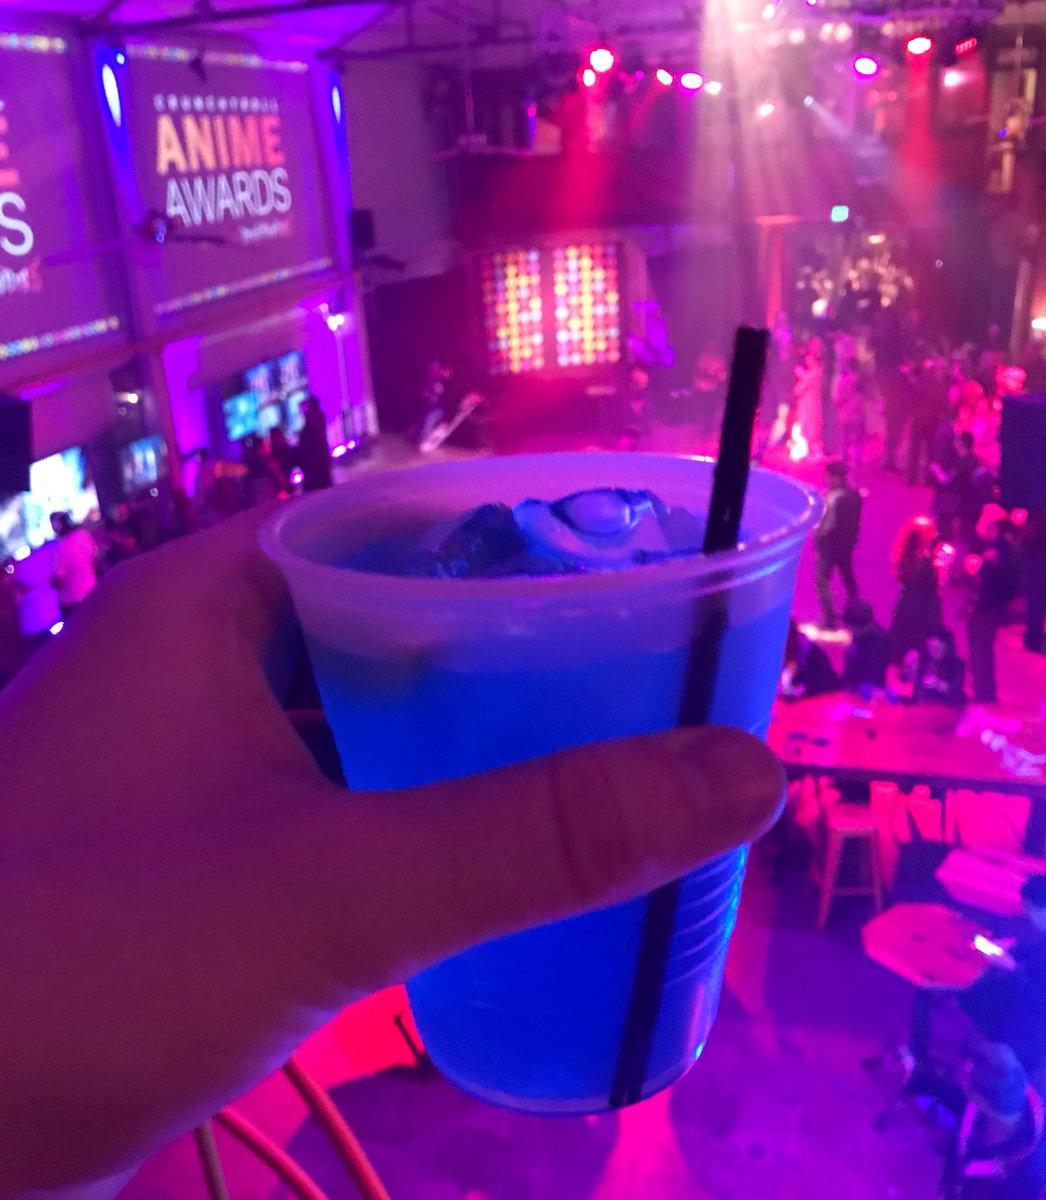 That Time I Got Reincarnated as a Lime! #AnimeAwards <br>http://pic.twitter.com/3bfQYrJEmM – à Folsom Street Foundry